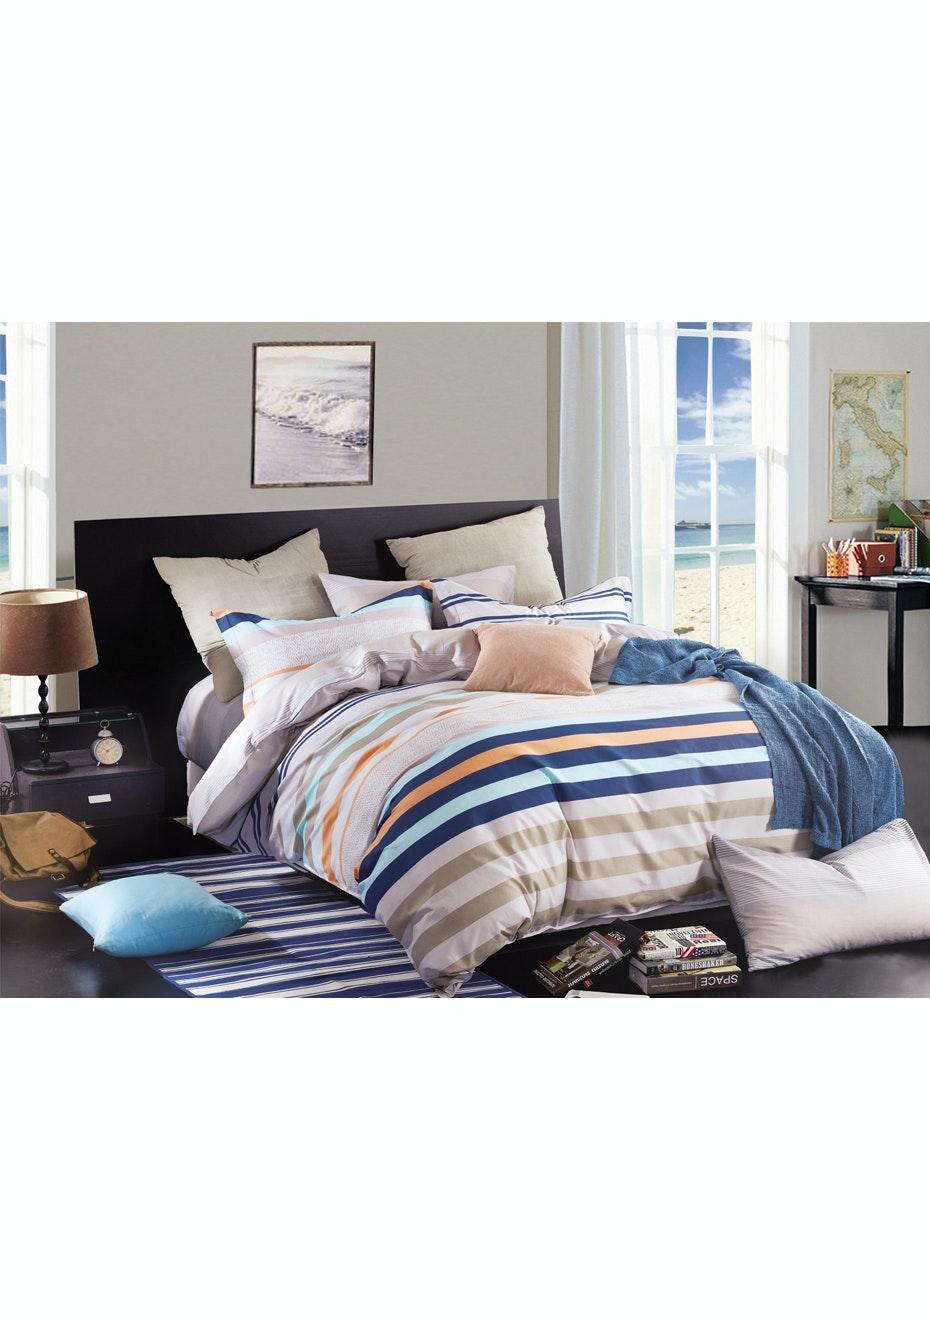 Sunset Quilt Cover Set - Reversible Design - 100% Cotton Queen Bed